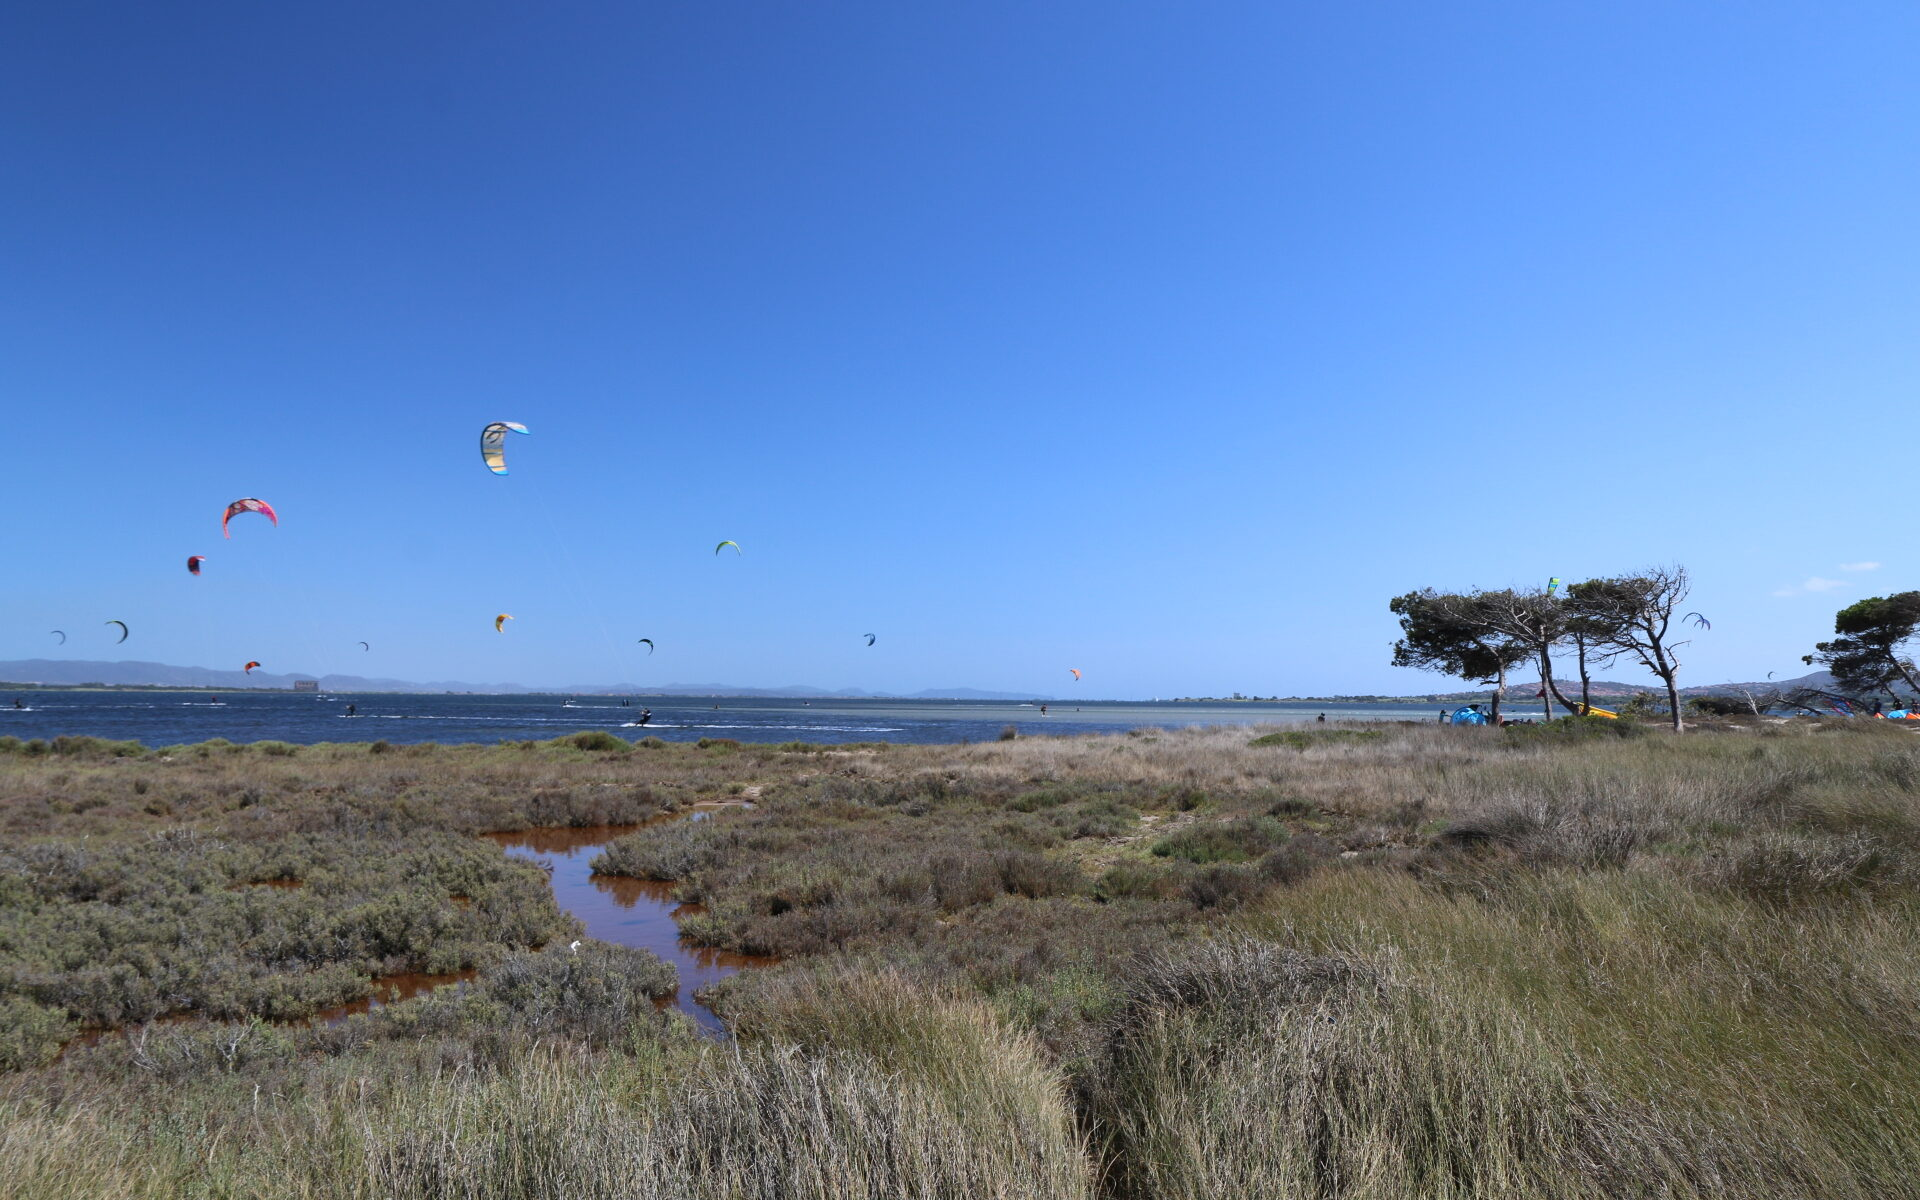 foto del famoso kite spot di Punta Trettu in sardegna